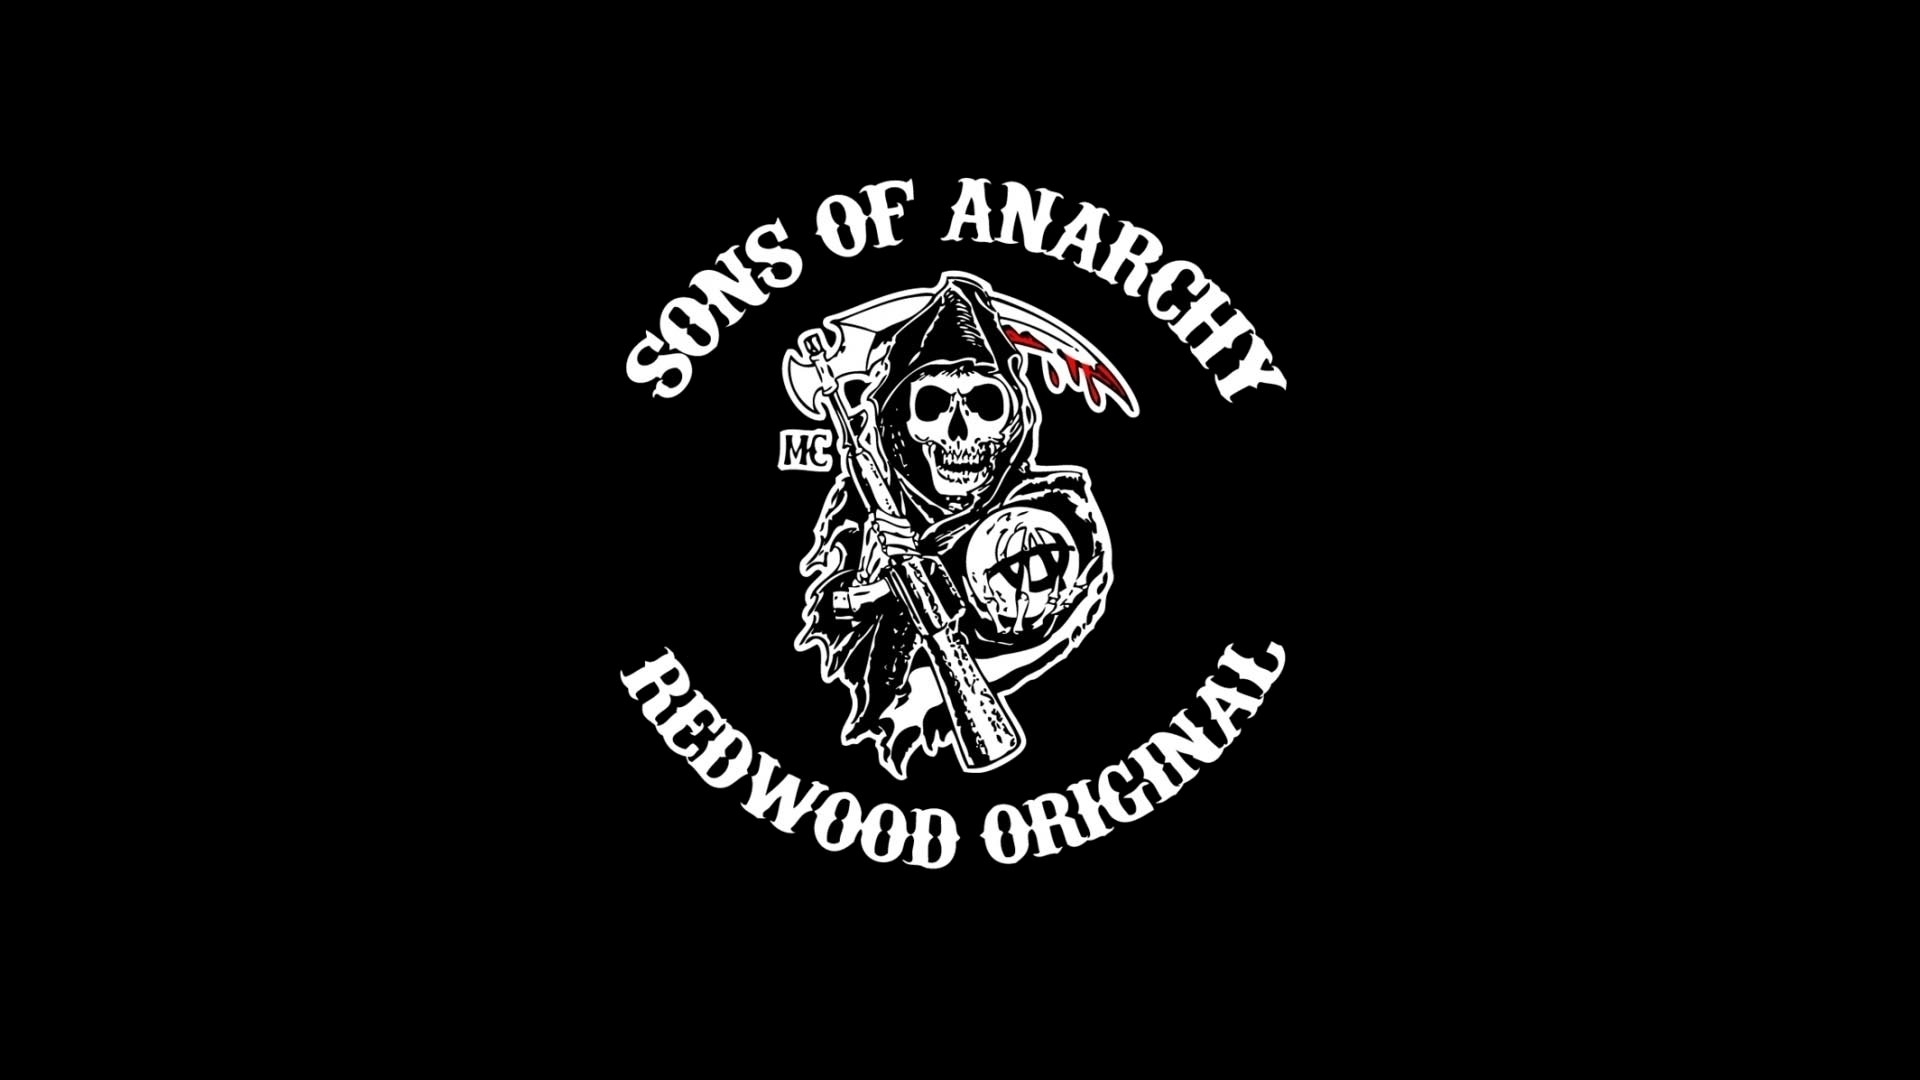 sons of anarchy full hd fond d'écran and arrière-plan | 1920x1080